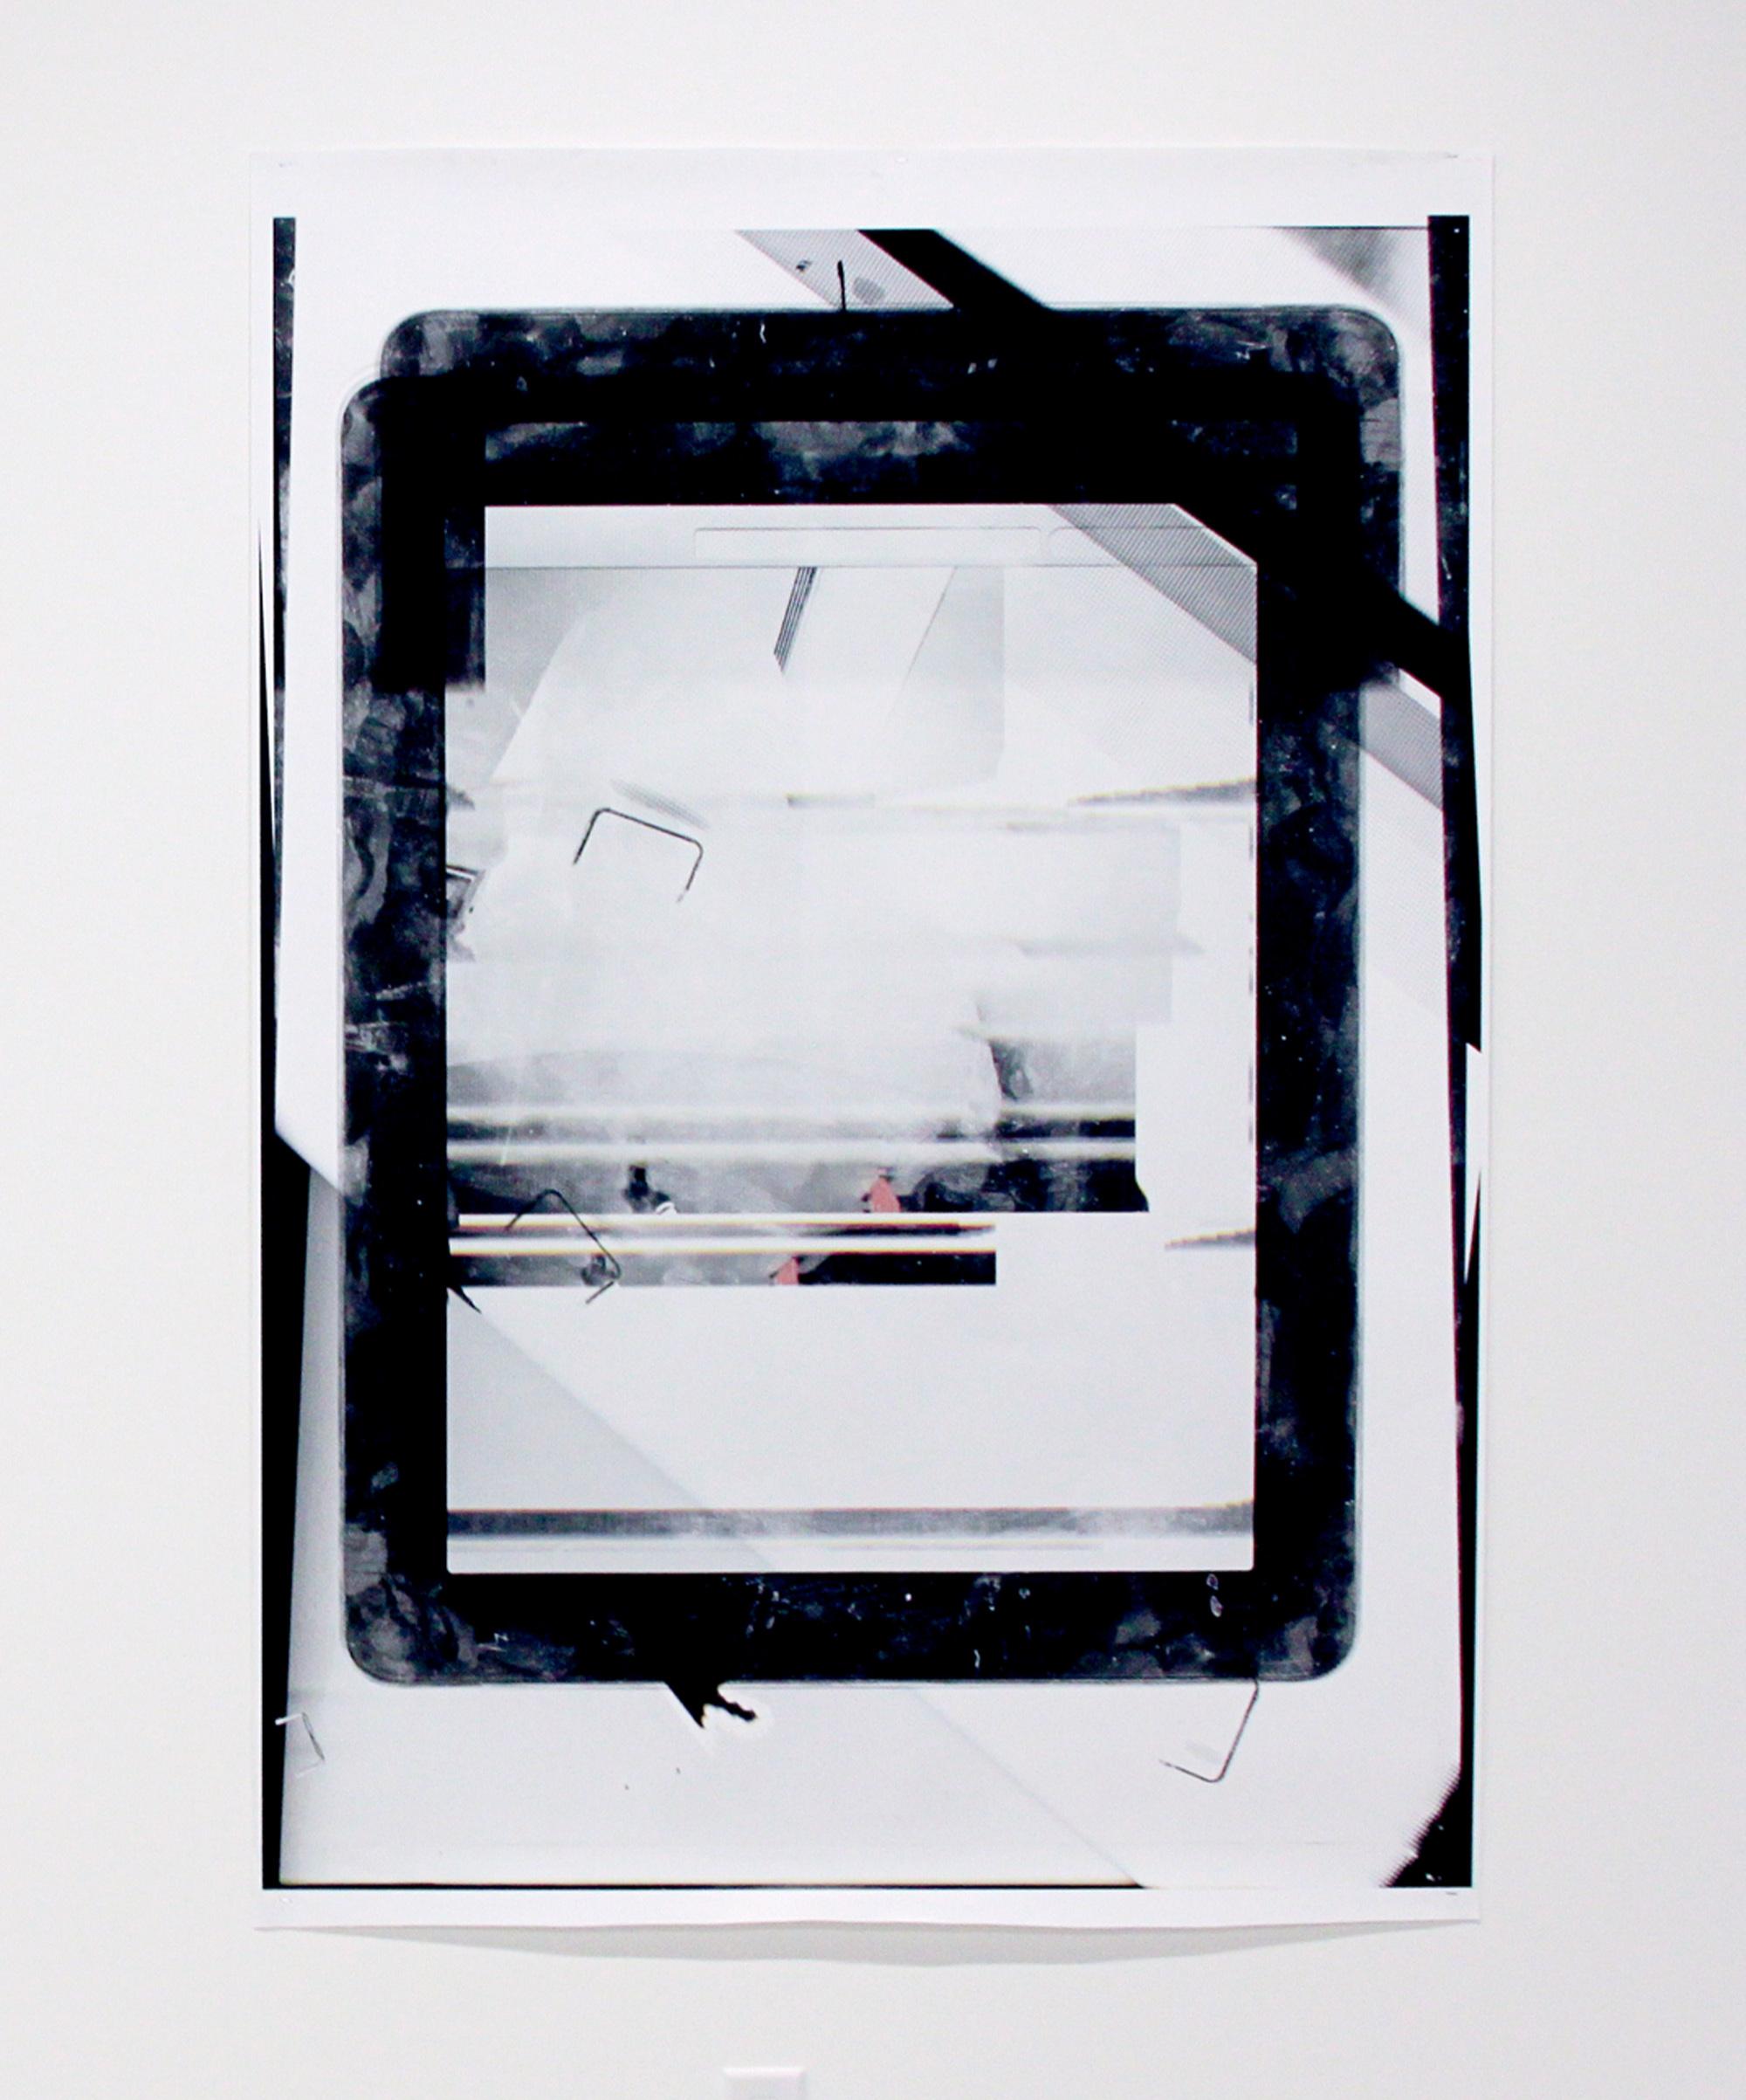 ANDREA LONGACRE-WHITE  Untitled , 2014, Archival inkjet print